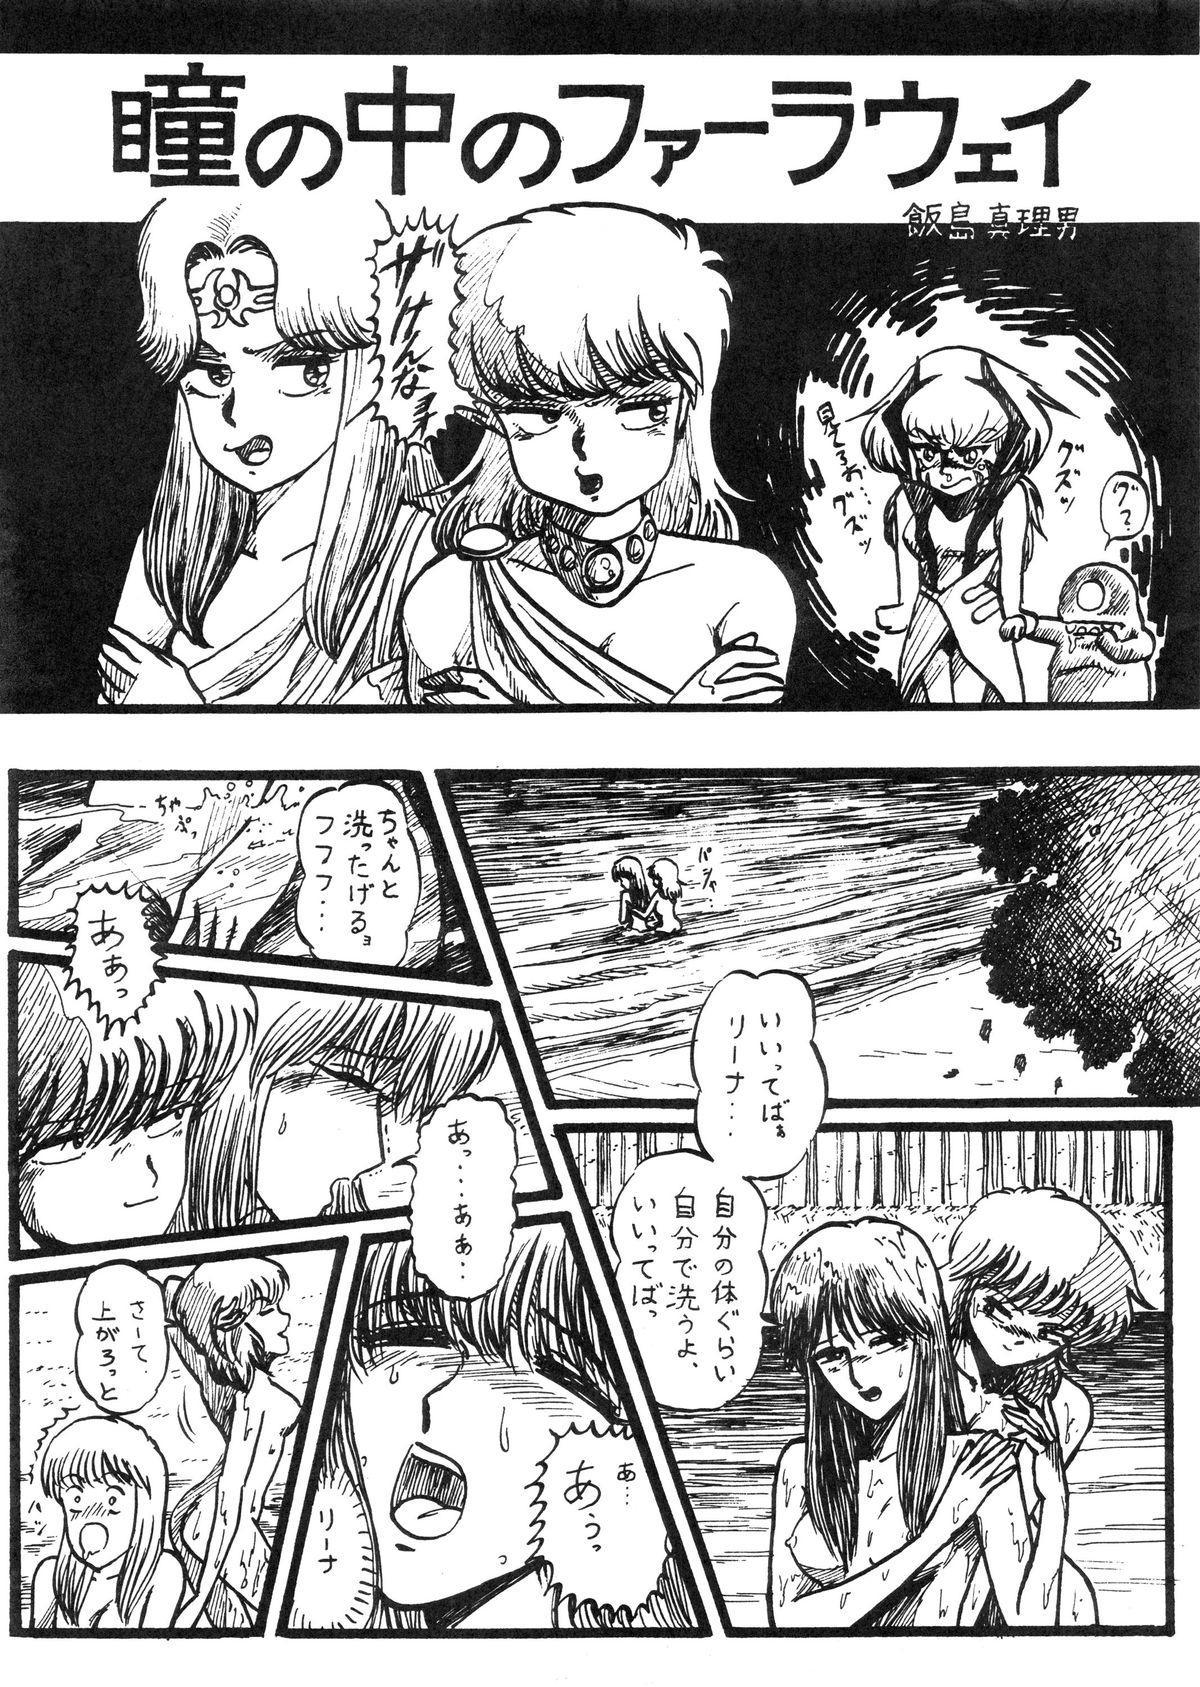 [Secret Society Chi (Iijima Mario)] Kai II - Iijima Mario Kojin-shi - (Various) 17